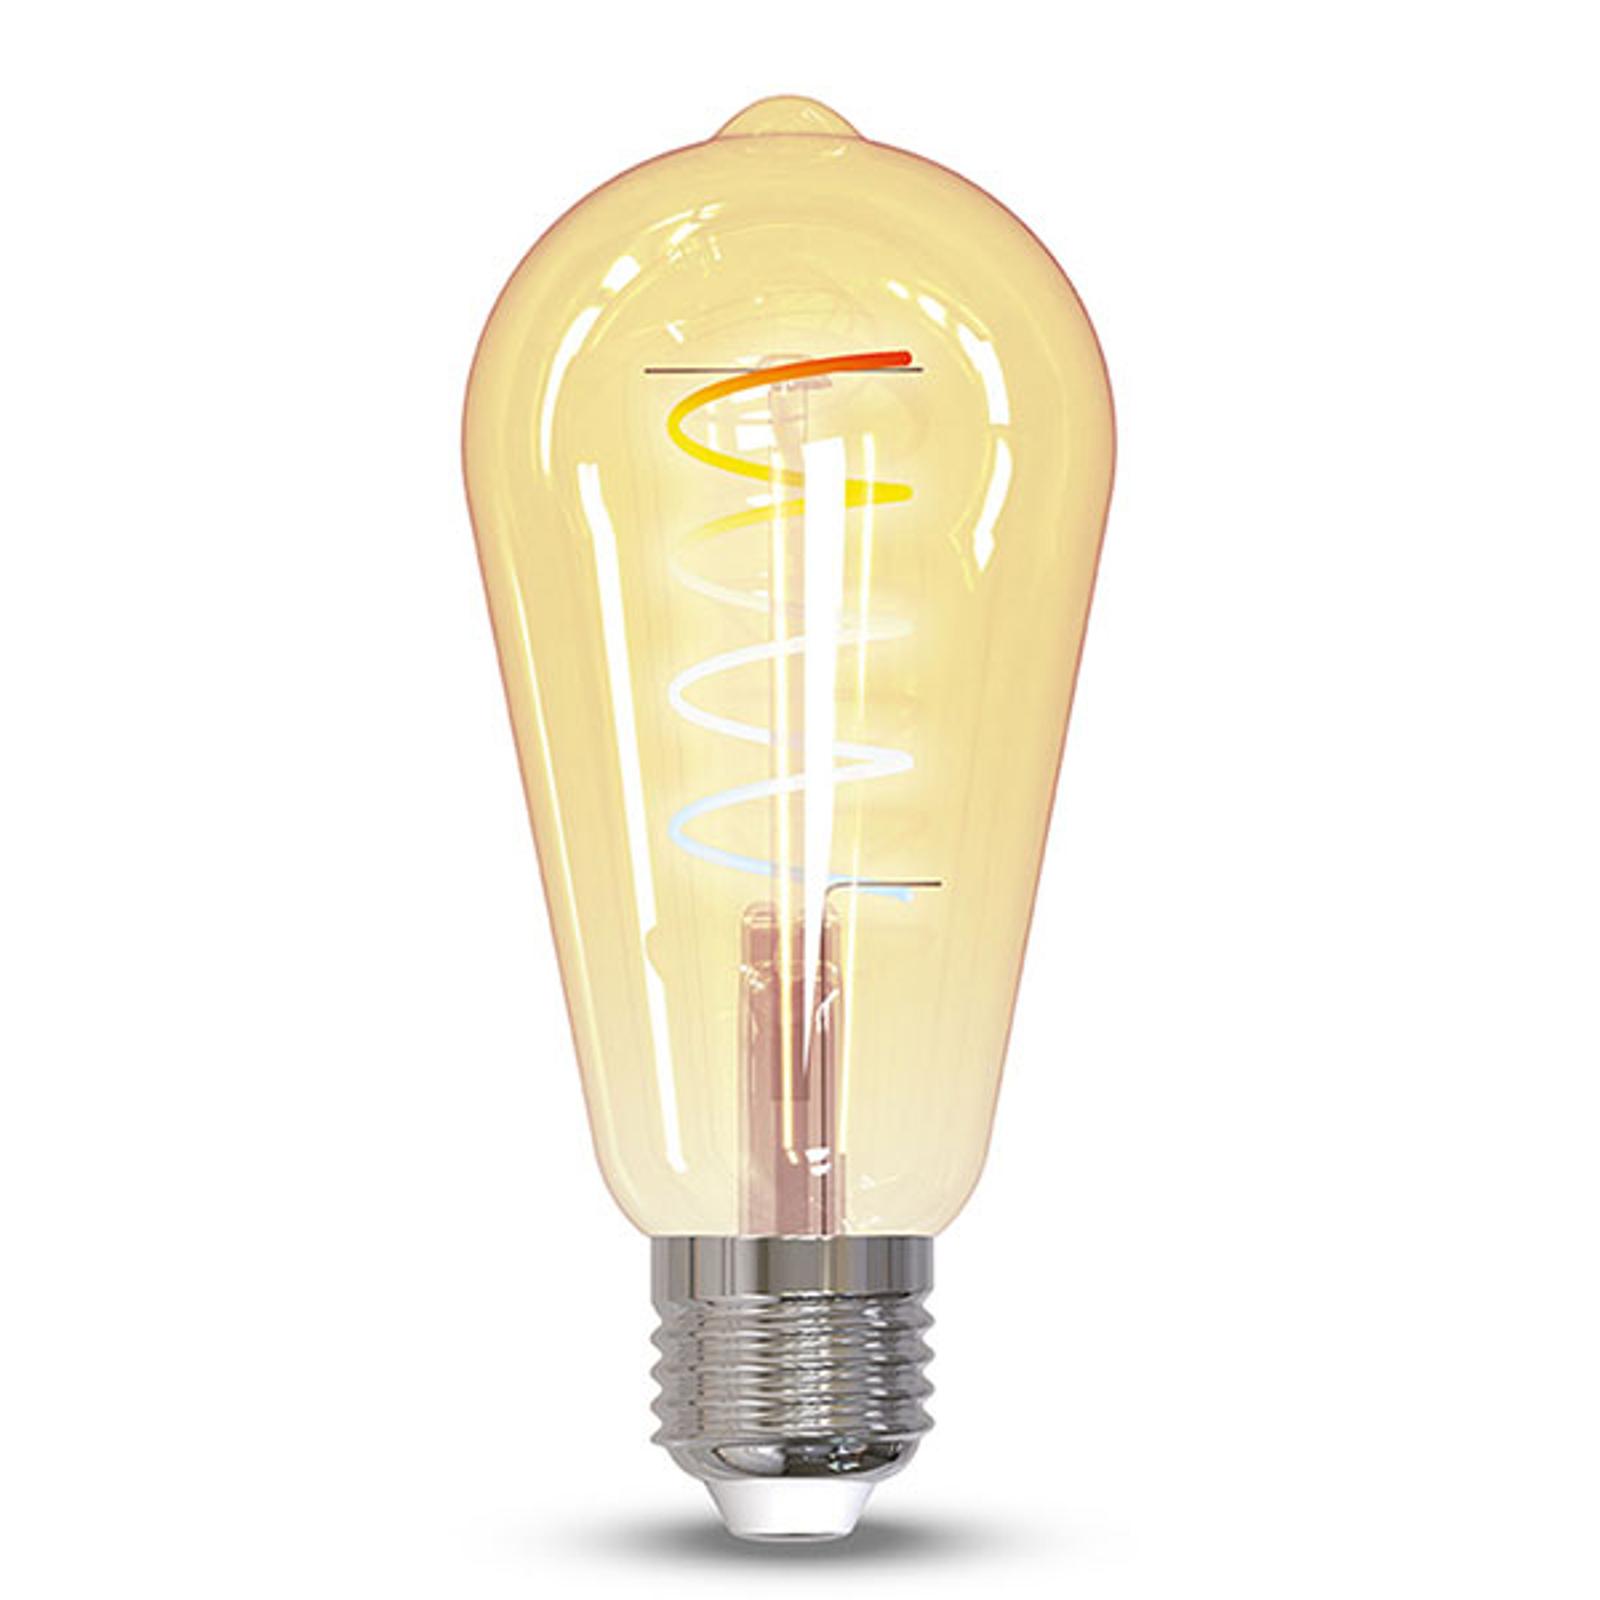 Müller Licht tint lampadina LED retro oro E27 5,5W